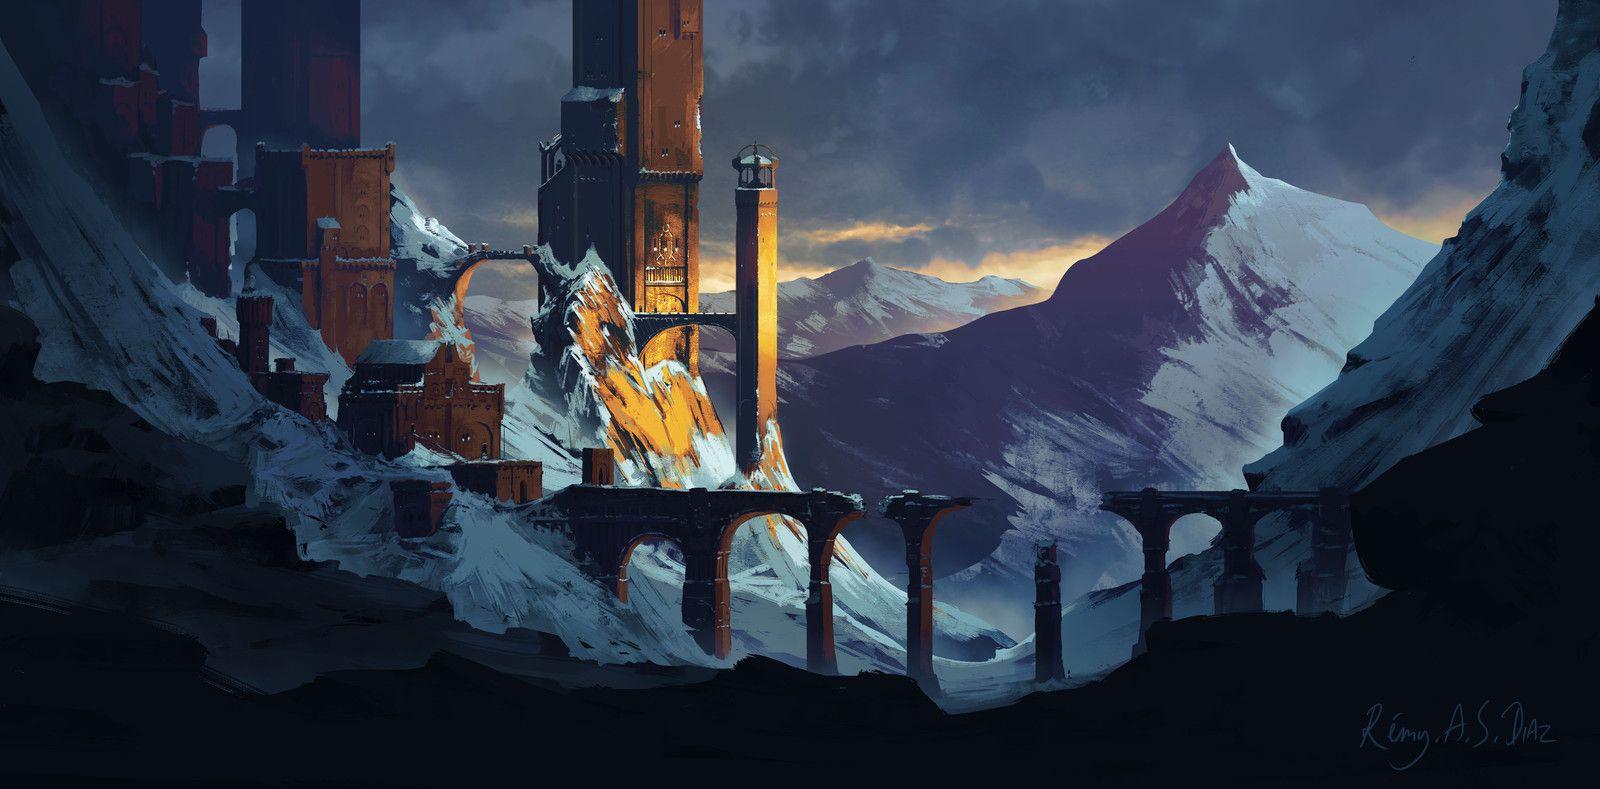 Fantasy Castle in Snow, Rémy A. S. Diaz on ArtStation at https://www.artstation.com/artwork/6x4a5